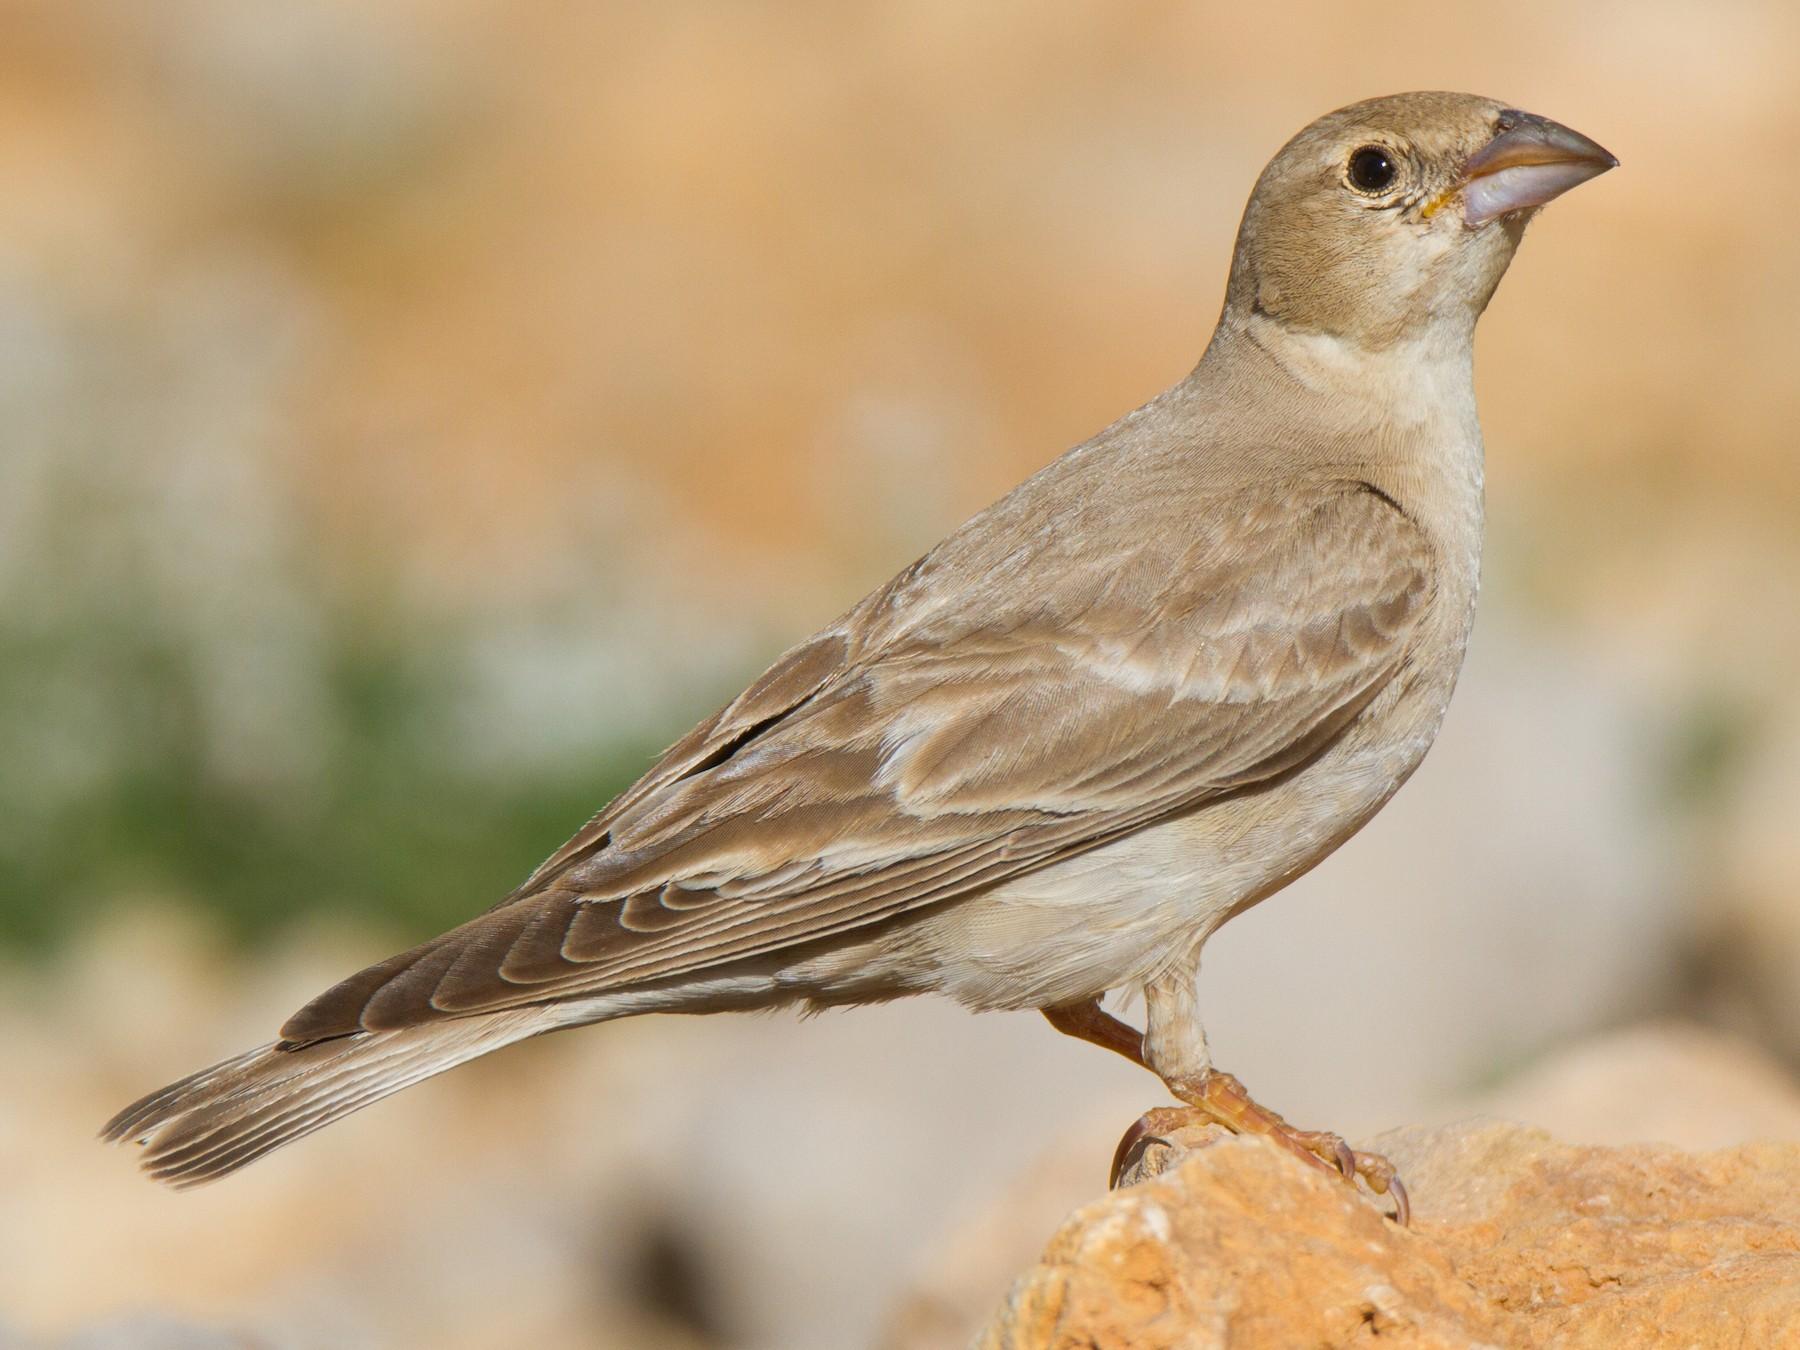 Pale Rockfinch - Oree Efroni Naor